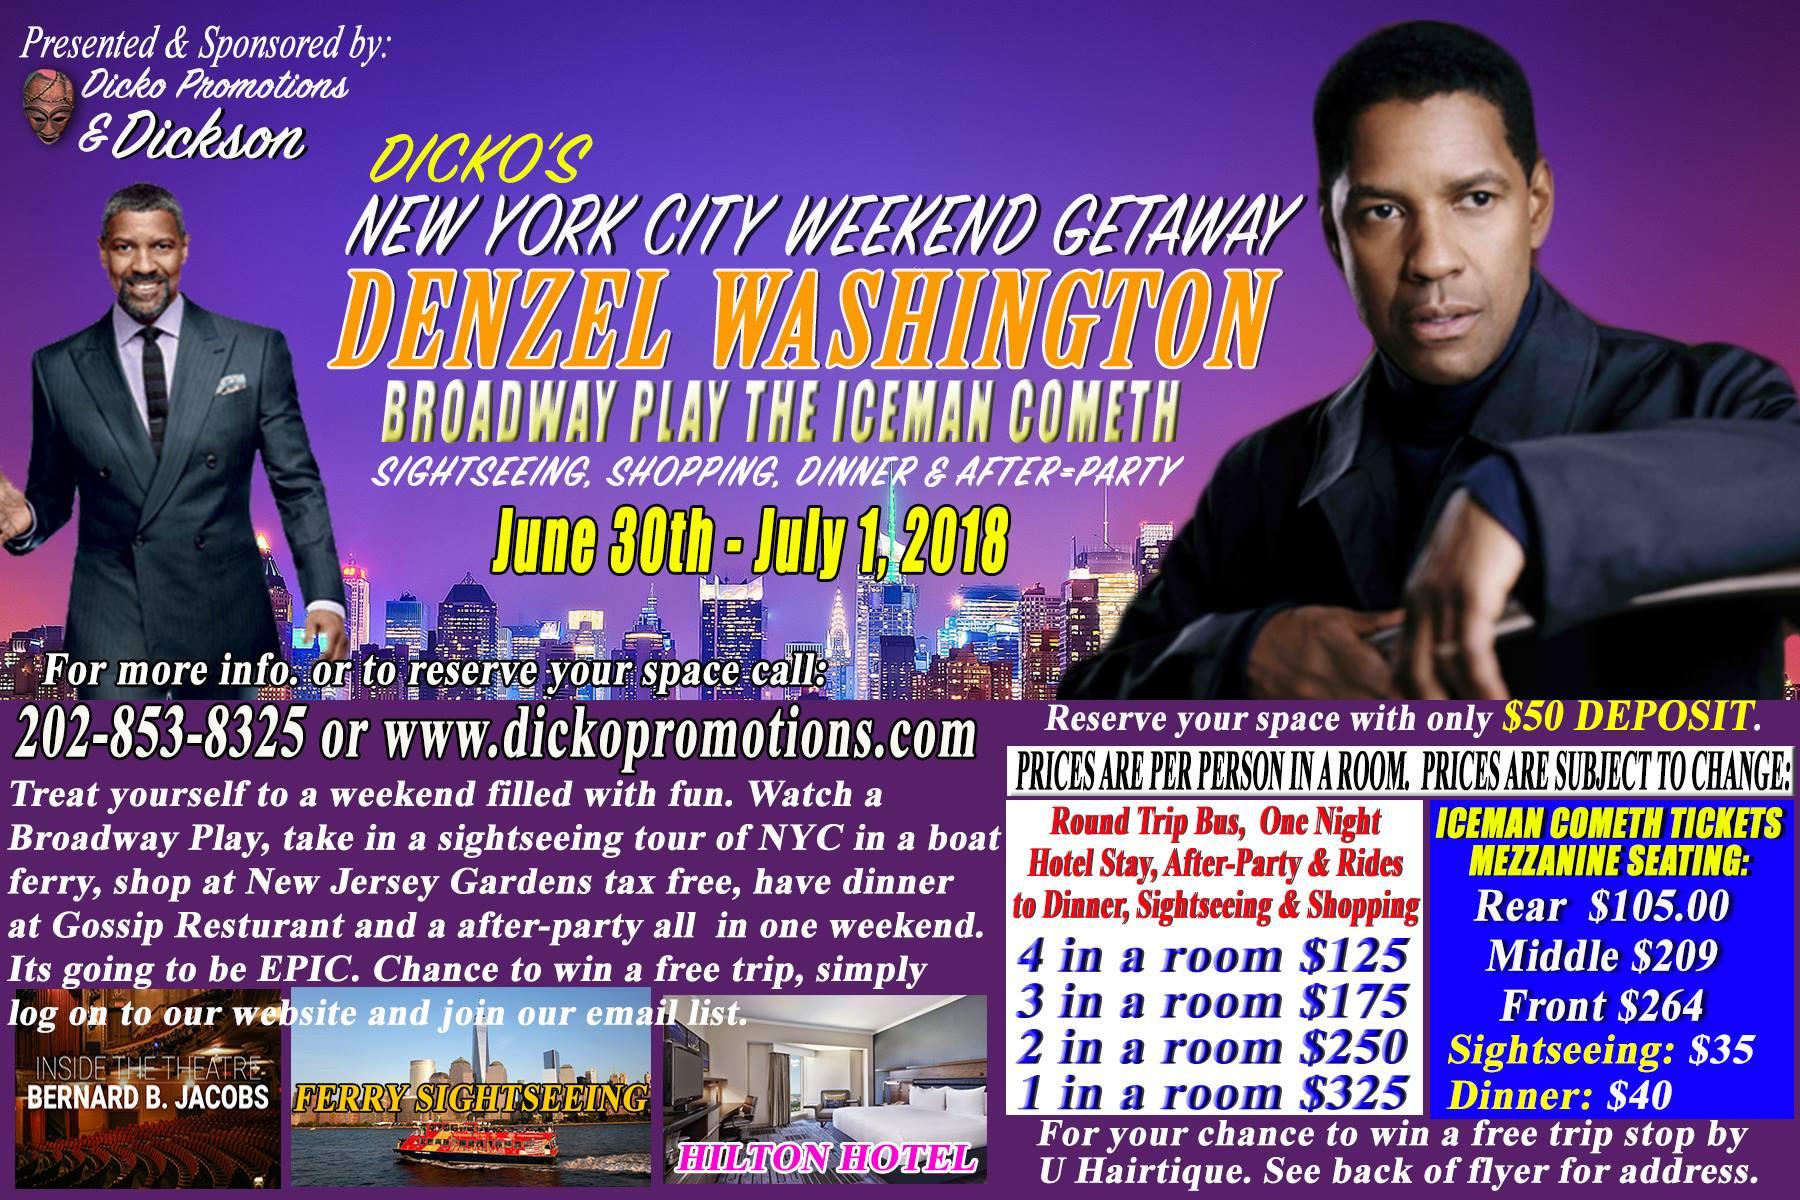 Dicko's NYC Getaway 2018